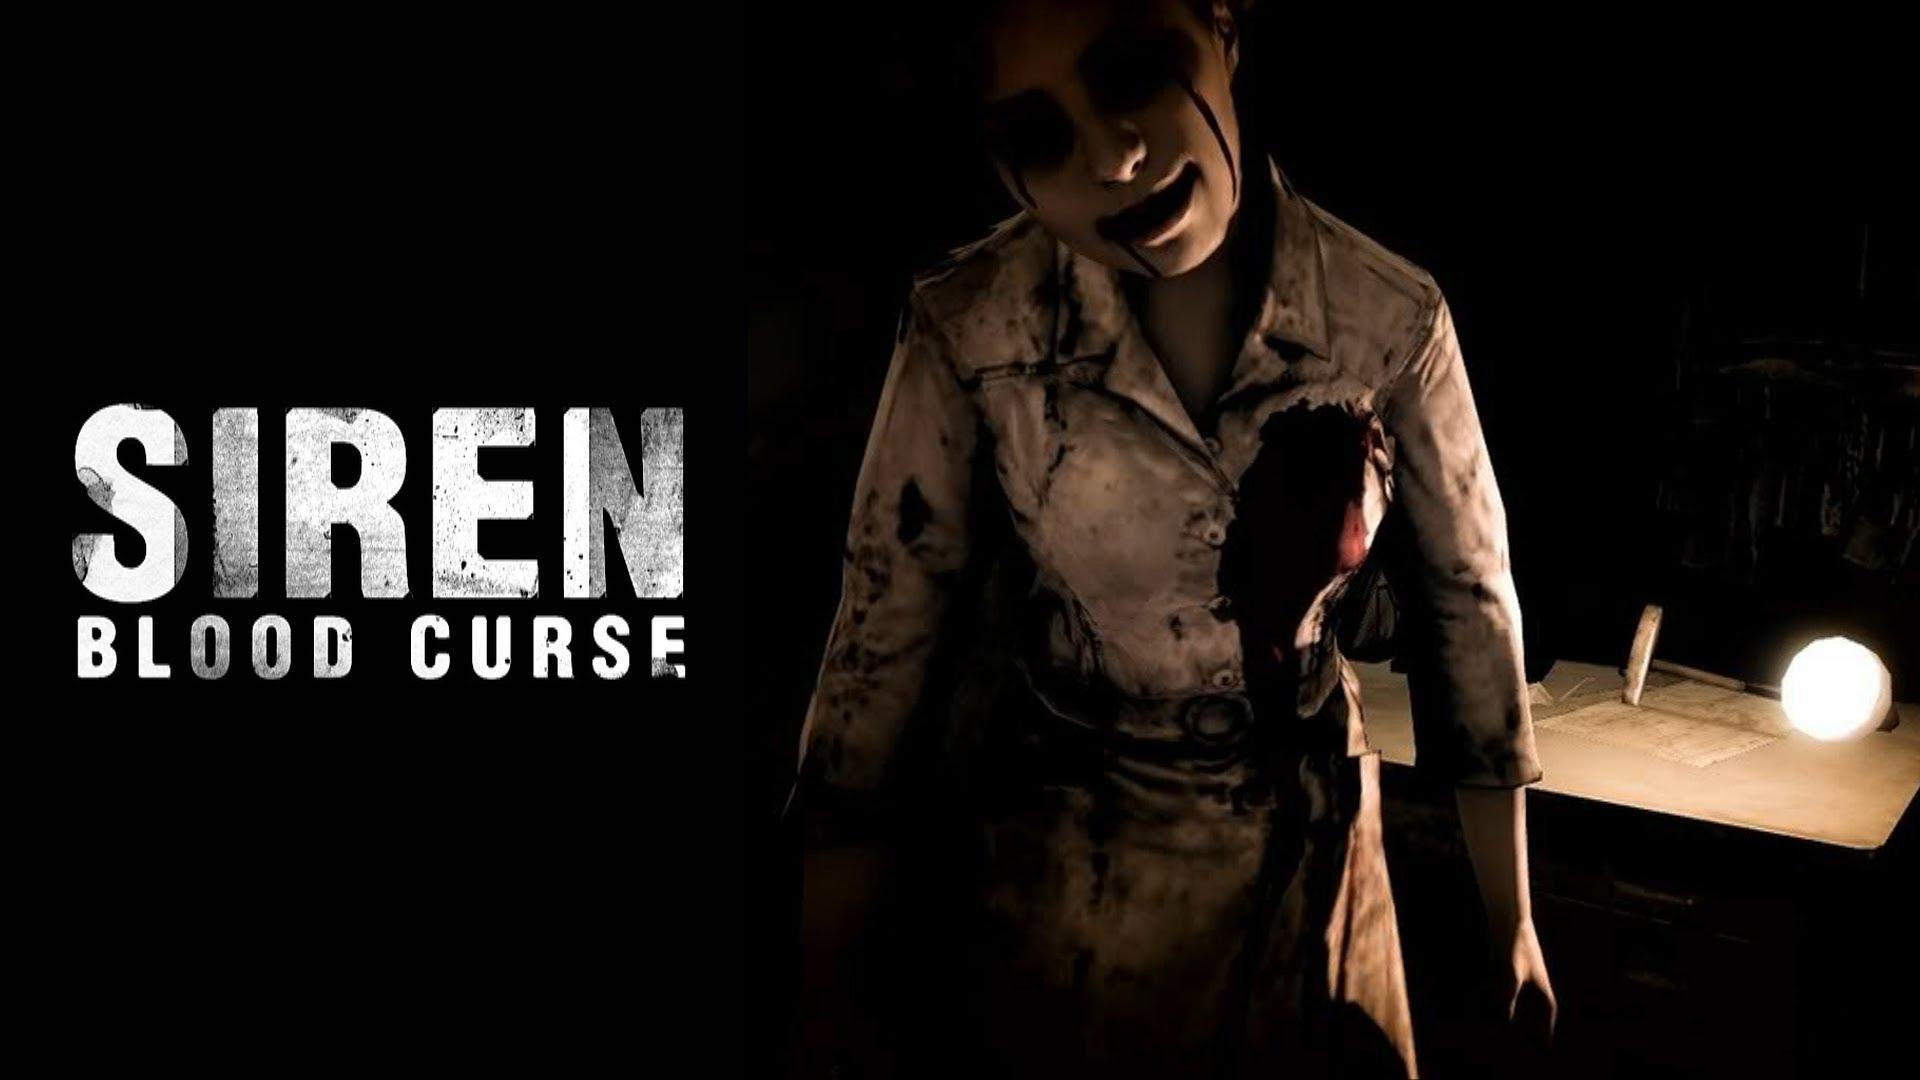 Siren: Blood Curse (2008)